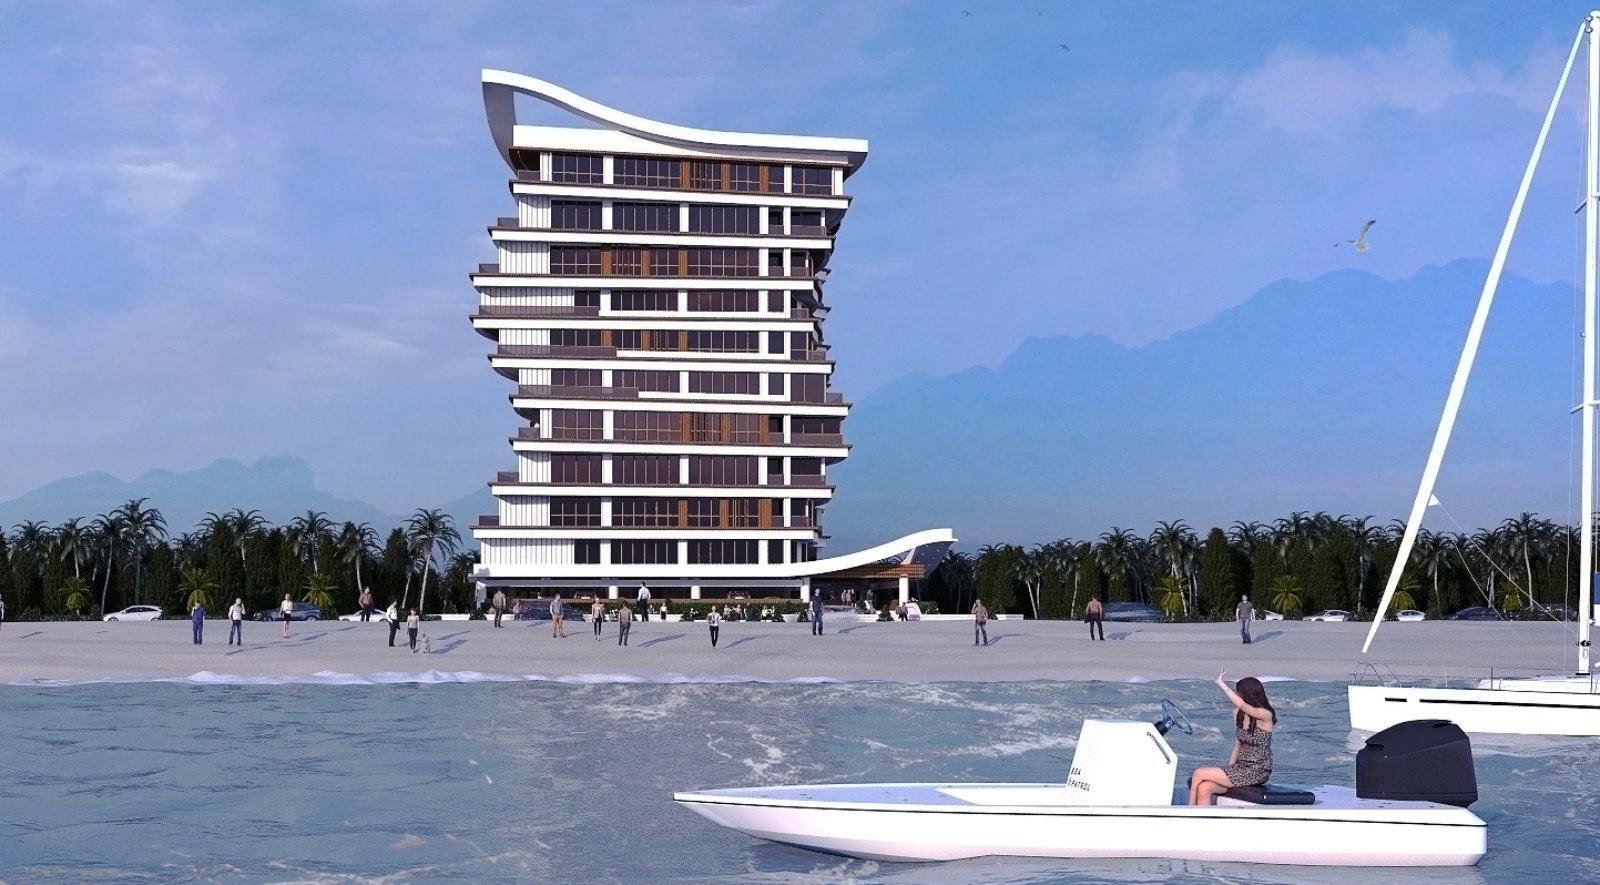 Ramsar Tower